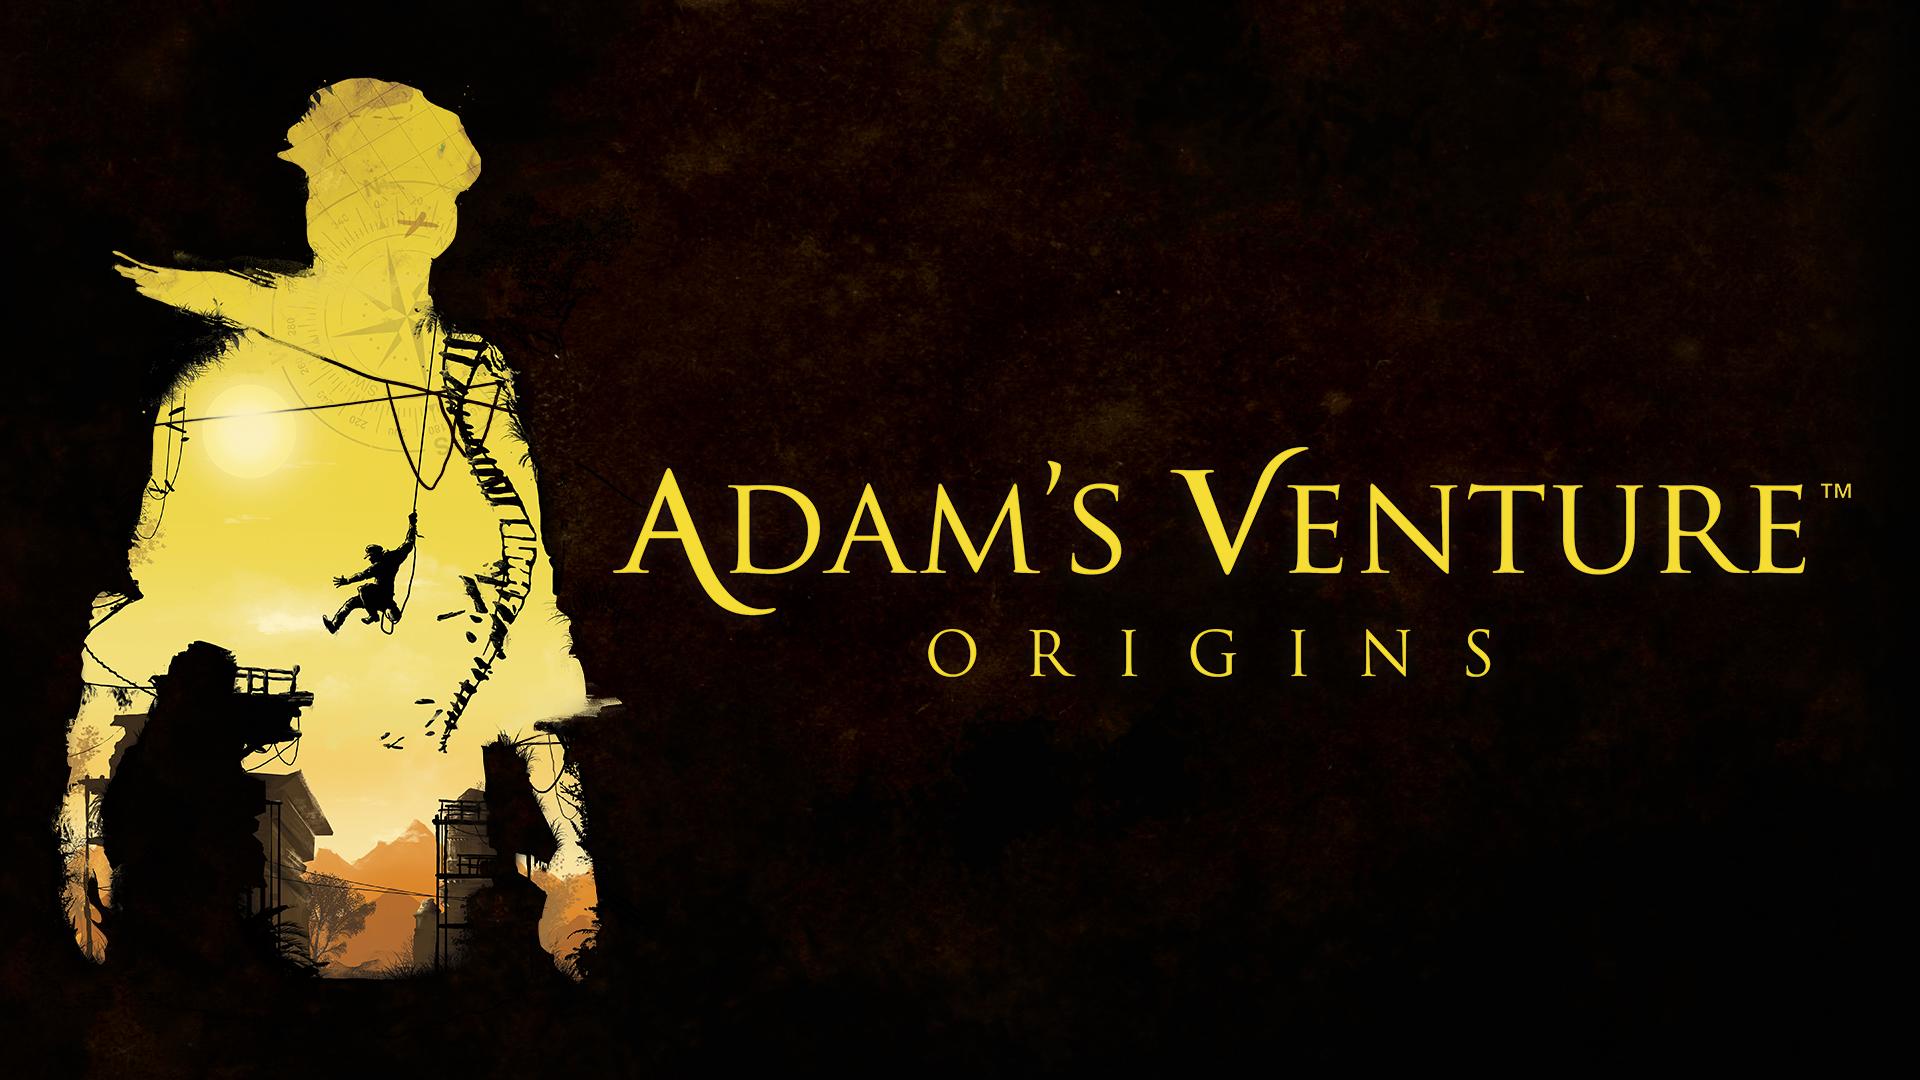 Adam's Venture: Origins, Soedesco, Vertigo Digital Entertainment, Nintendo, Nintendo Switch, IndieNation